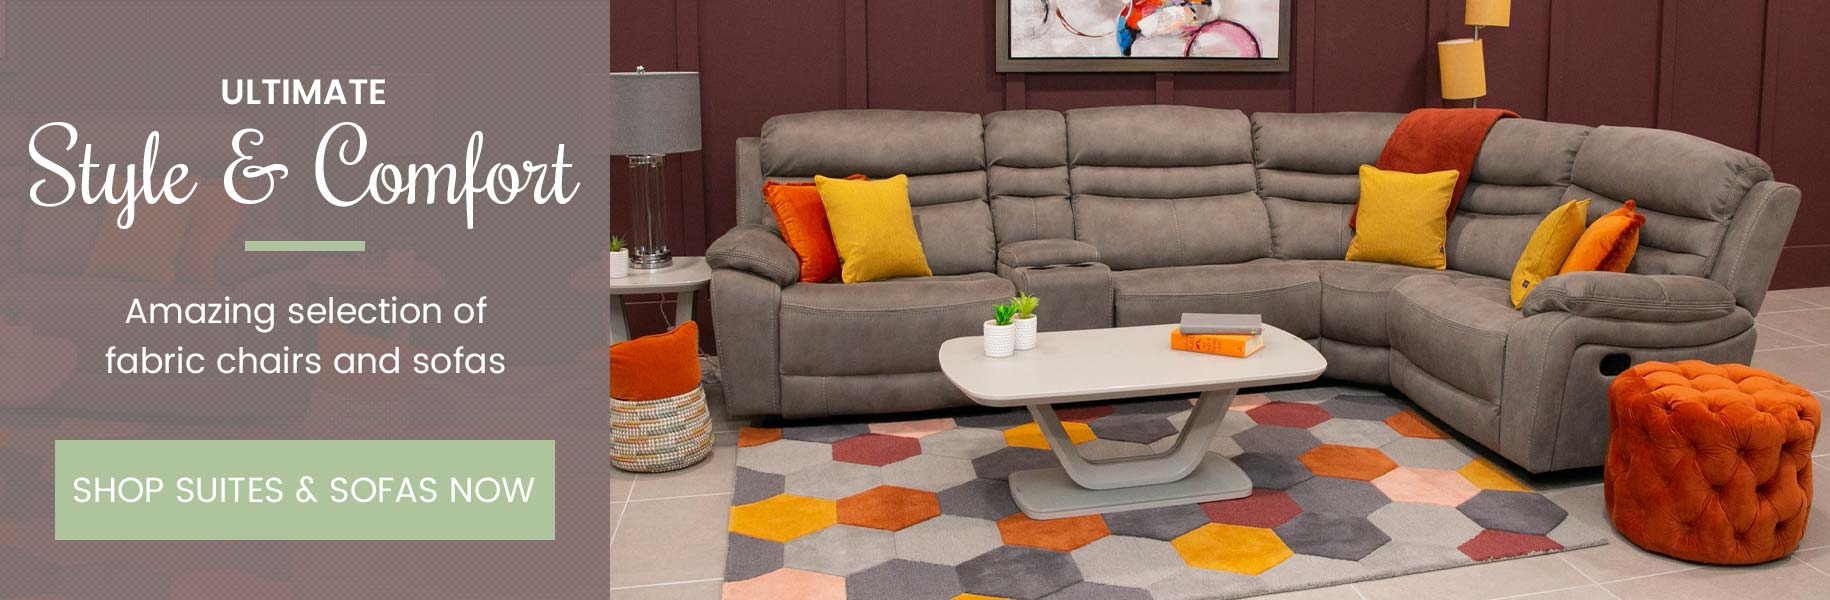 Castle Davitt Furniture - Shop Furniture Online